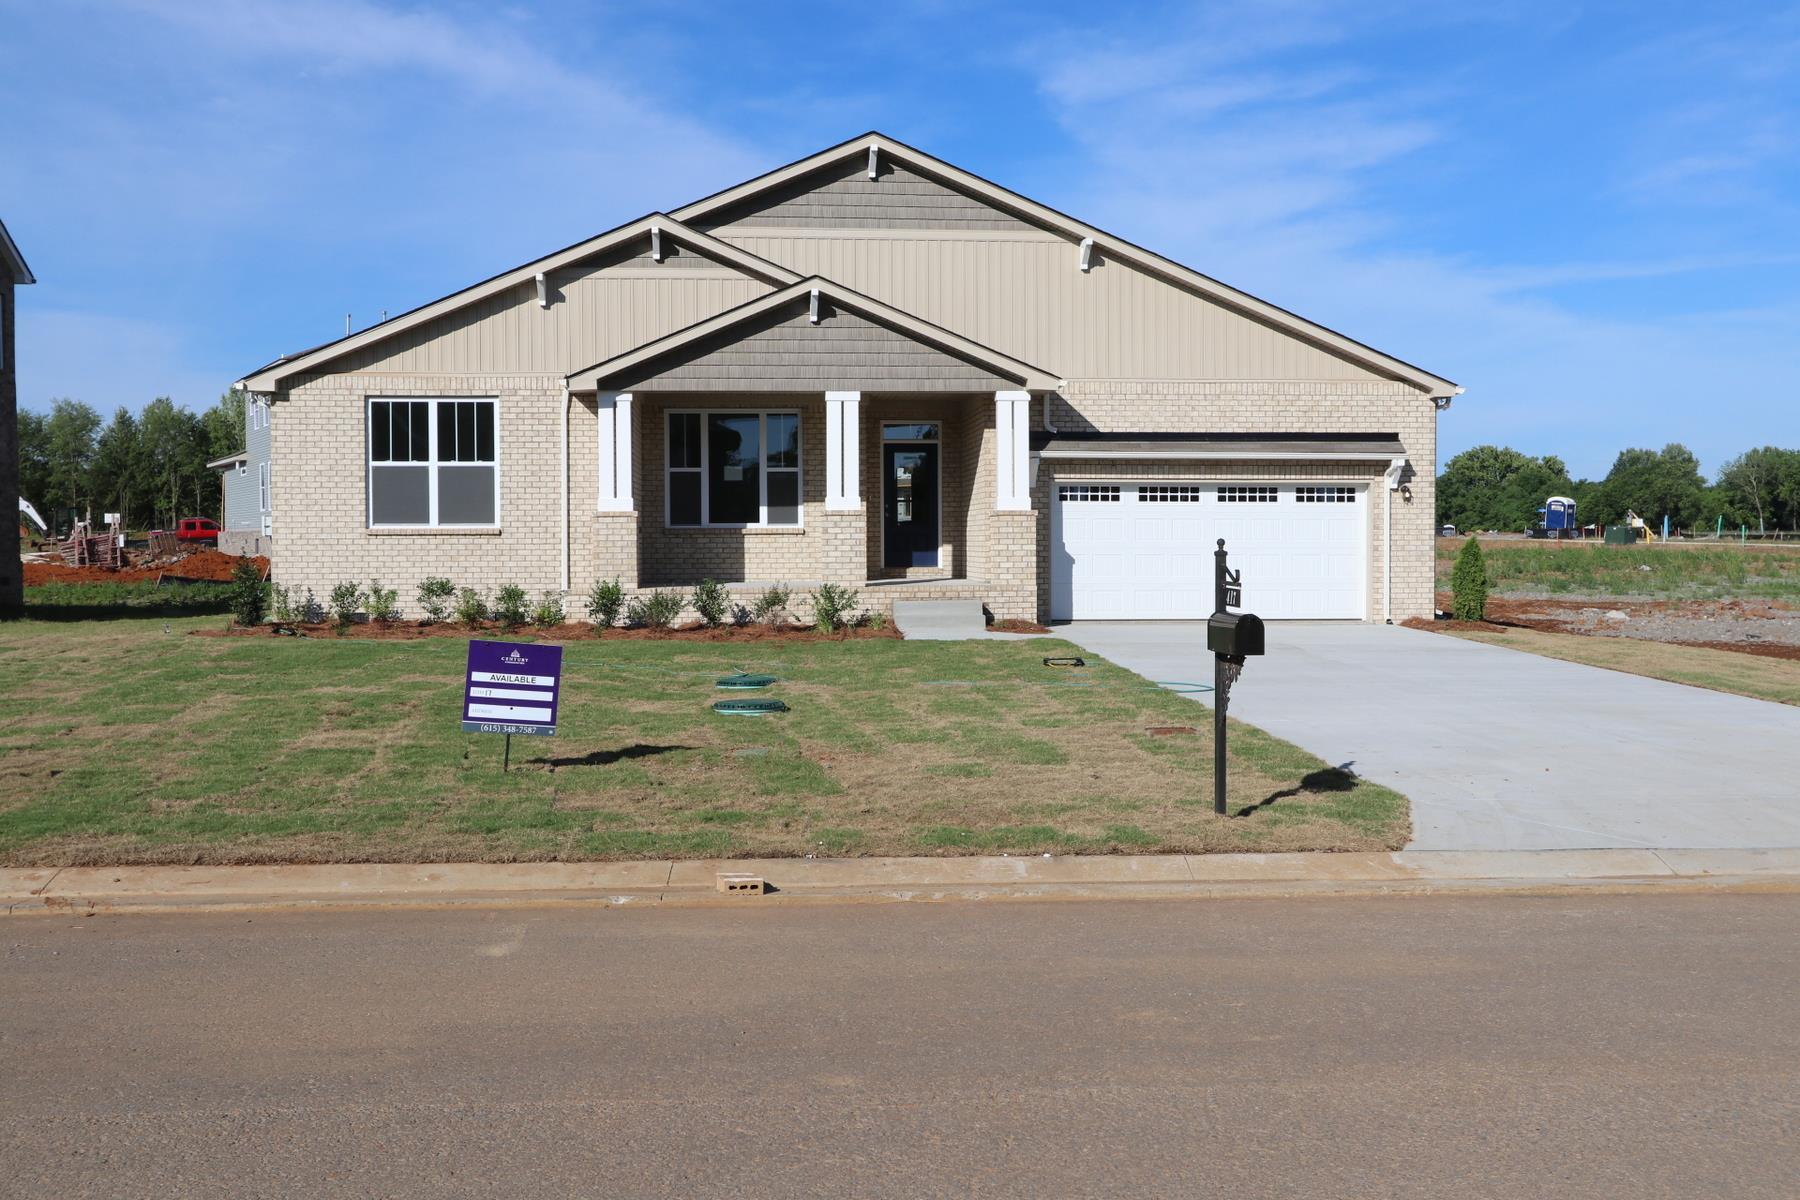 417 Davenport Drive Lot 17, Murfreesboro, TN 37128 - Murfreesboro, TN real estate listing